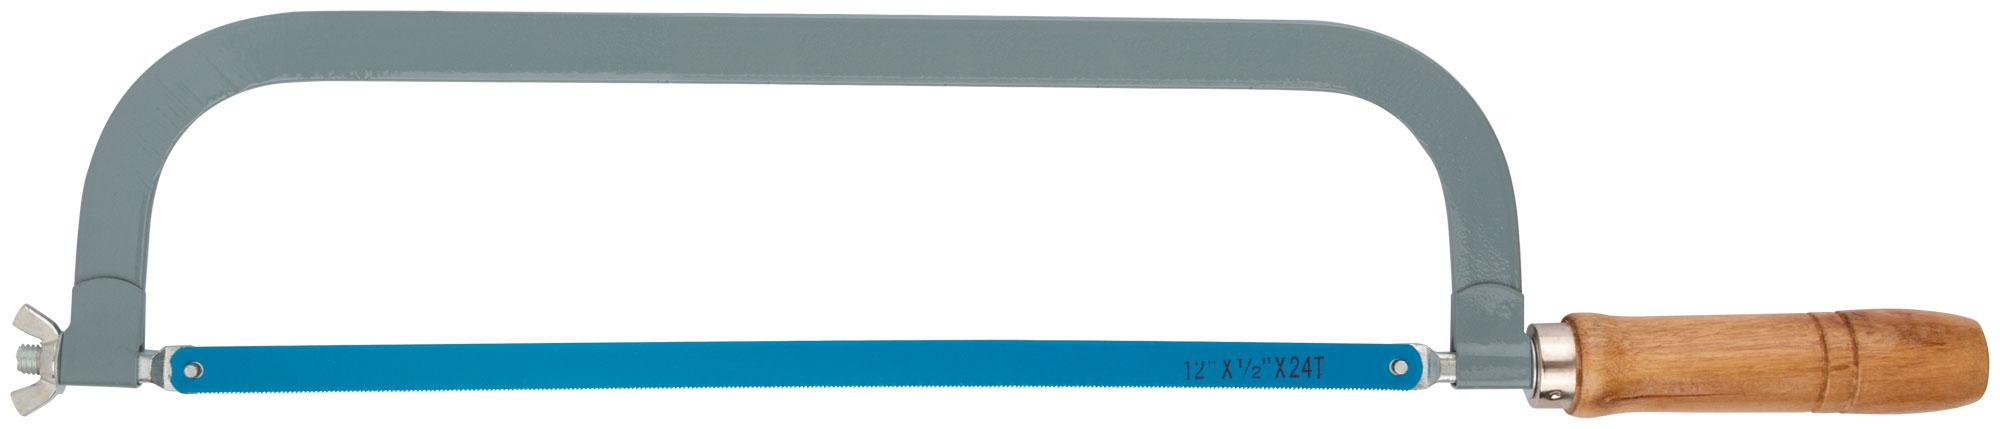 Ножовка по металлу Fit 40051